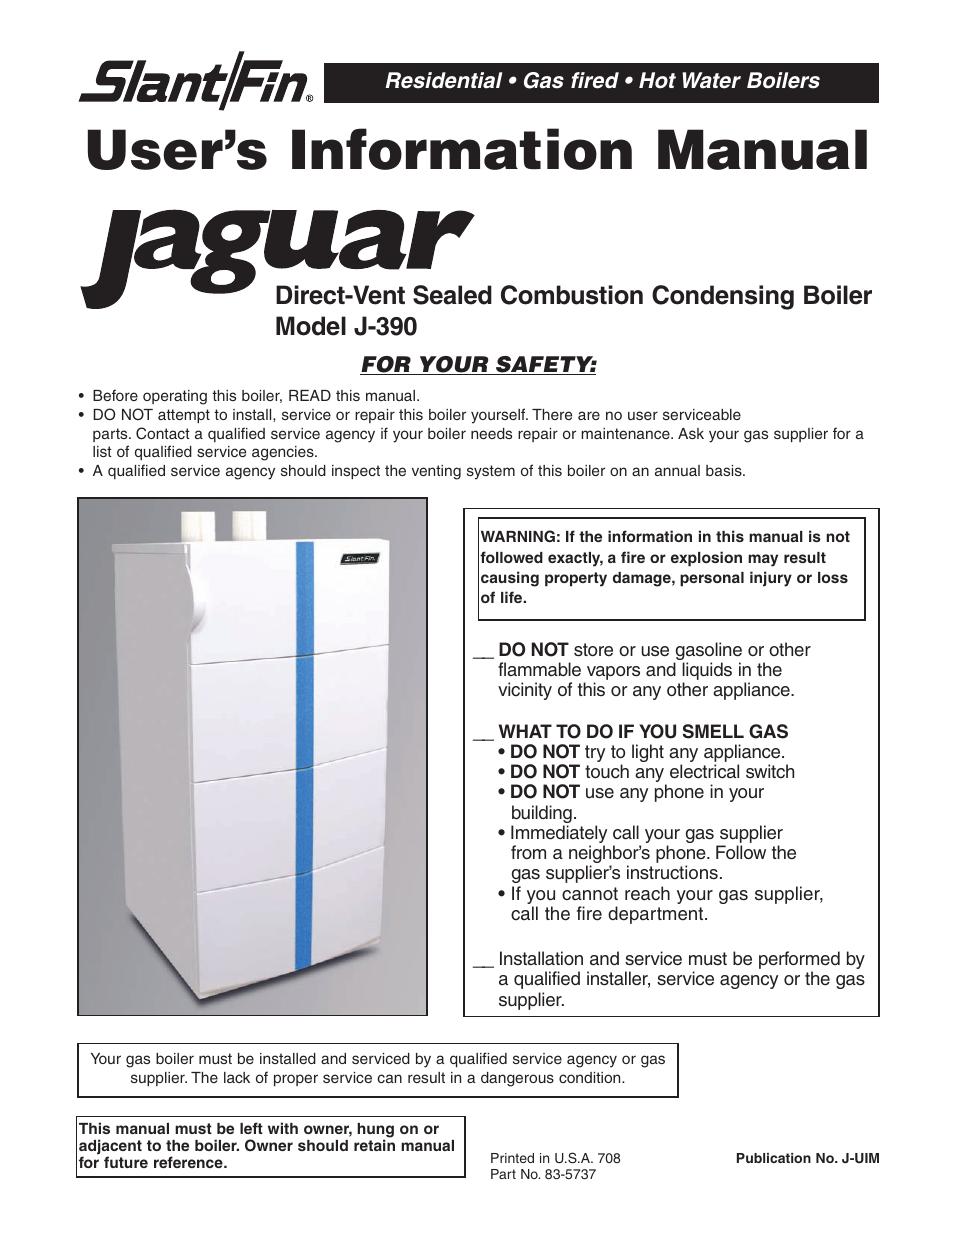 Slant Fin Jaguar J 390 User Manual 12 Pages Boiler Wiring Diagram